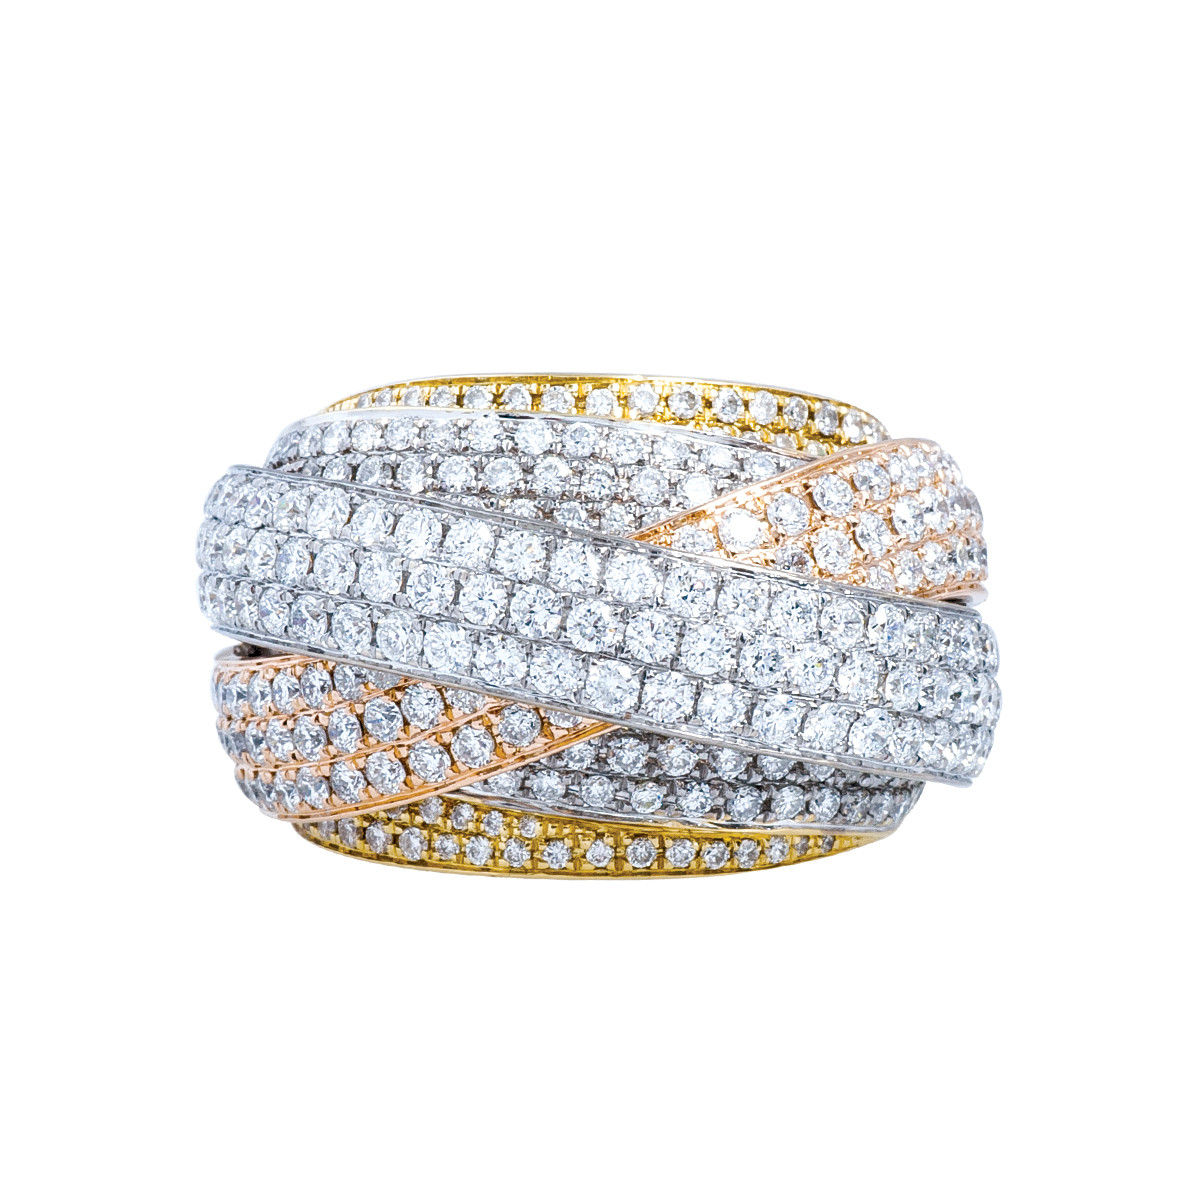 Vintage 4.03 CTW Diamond Ring